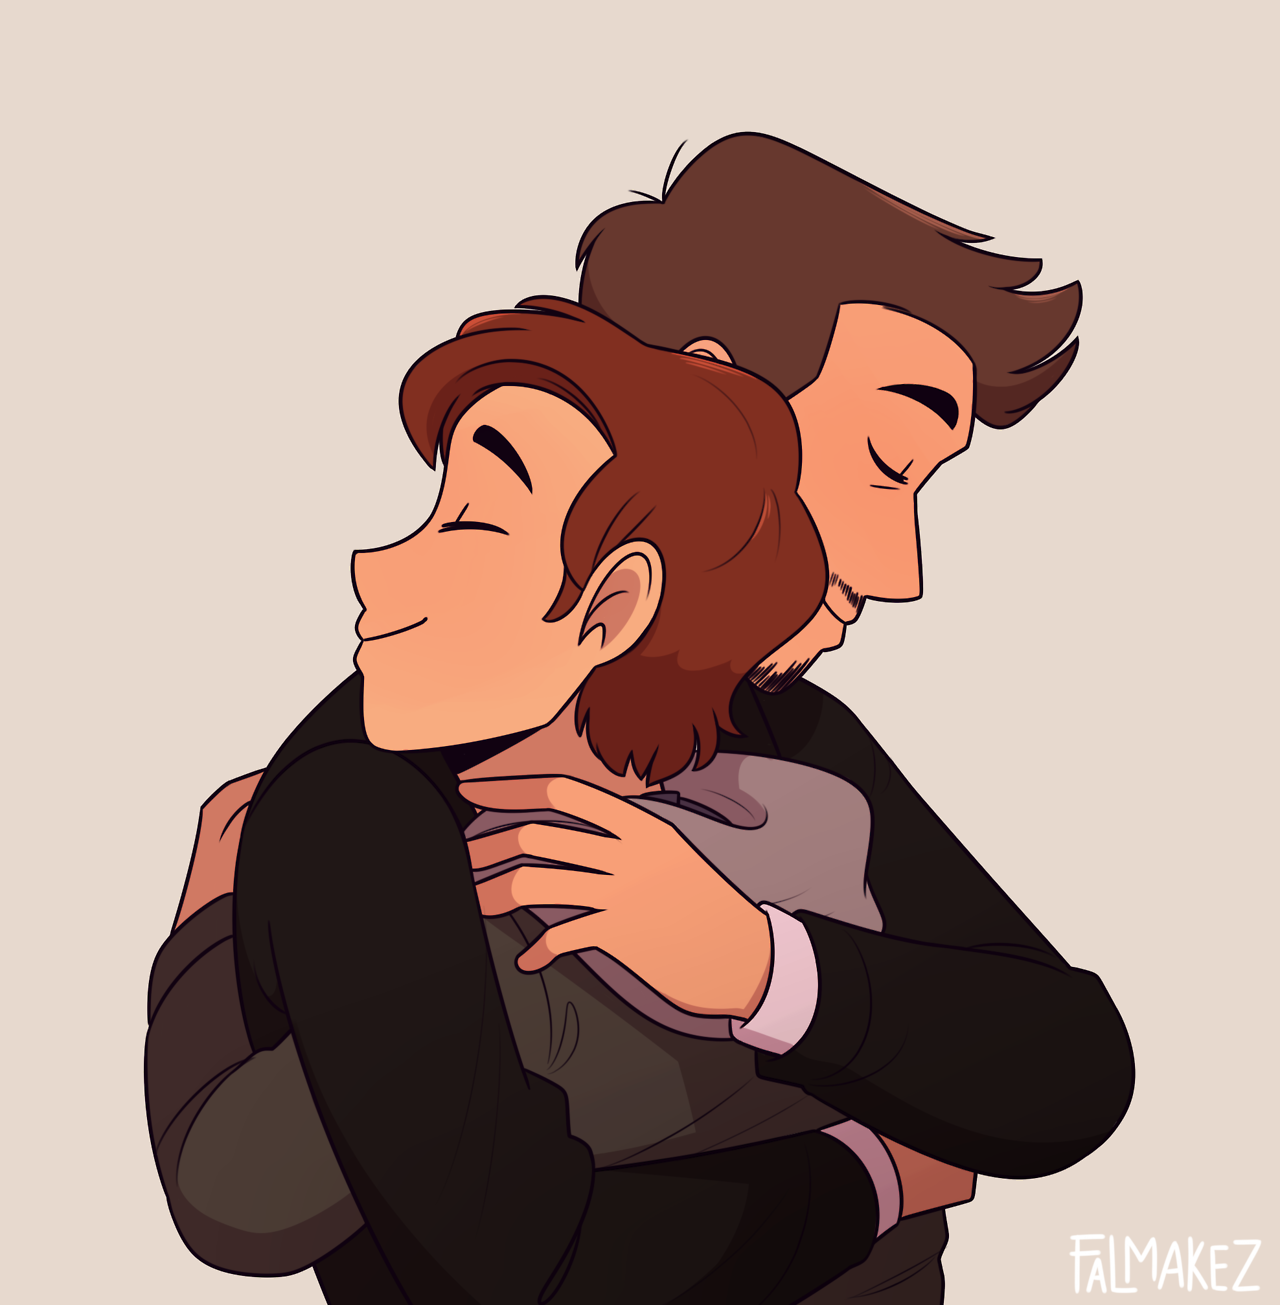 Spiderman Hug Tony Stark,Peter Parker